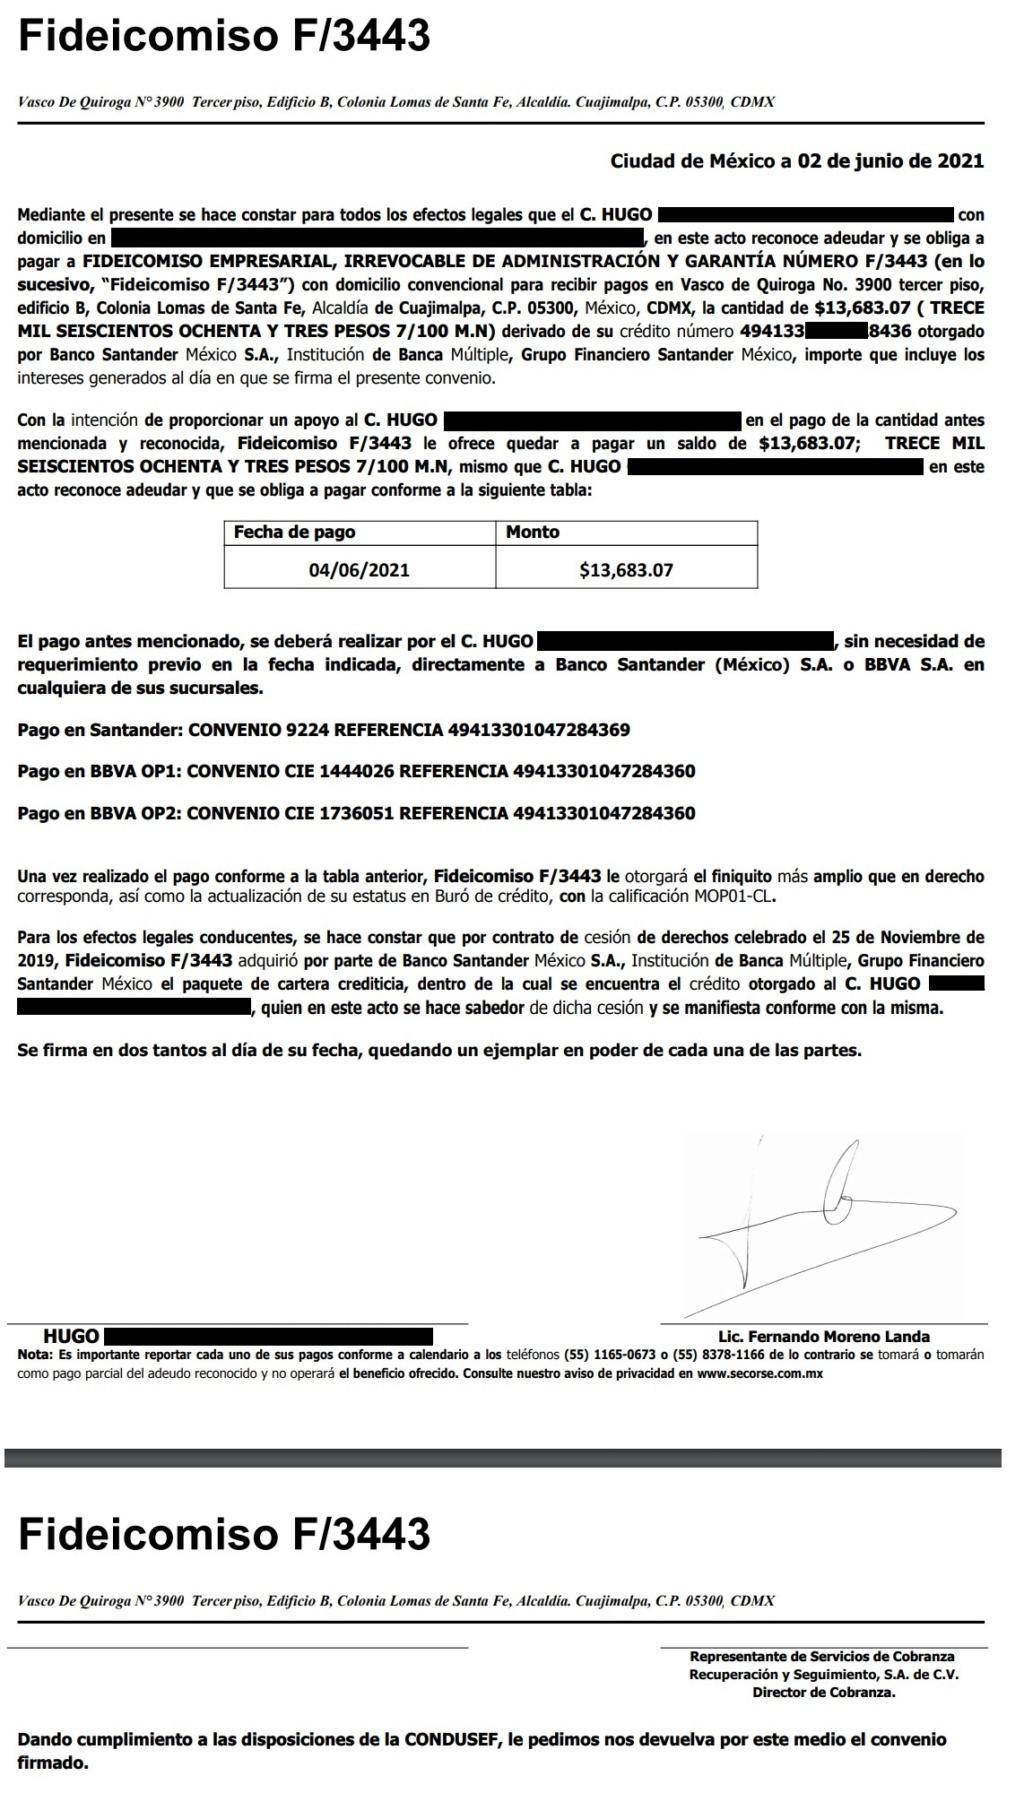 Validacion de carta convenio Scorse/Fideicomiso F/3443 Conven10